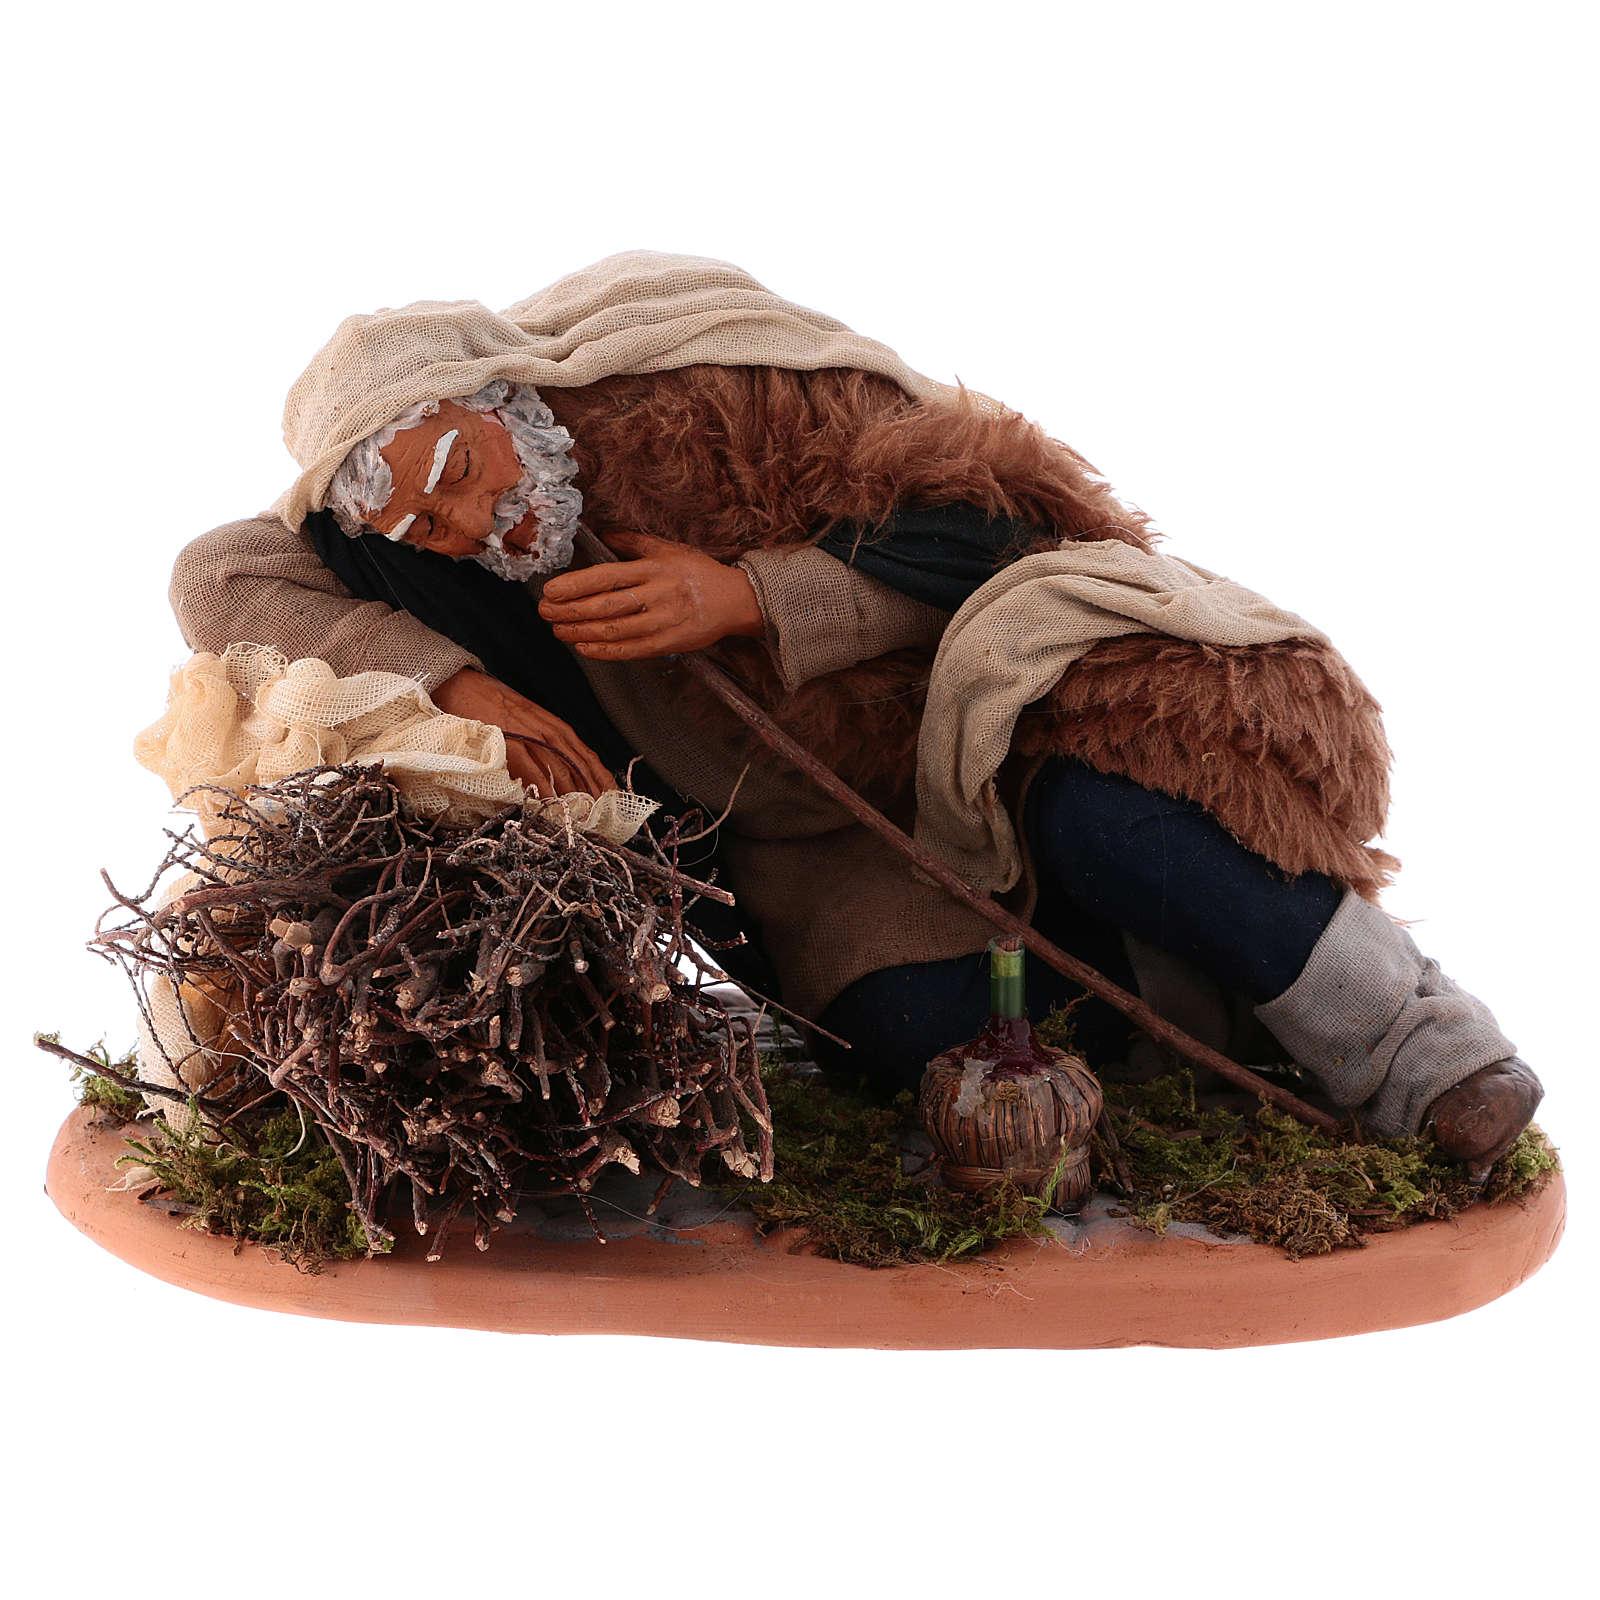 Sleeping man, Neapolitan Nativity 30cm 4